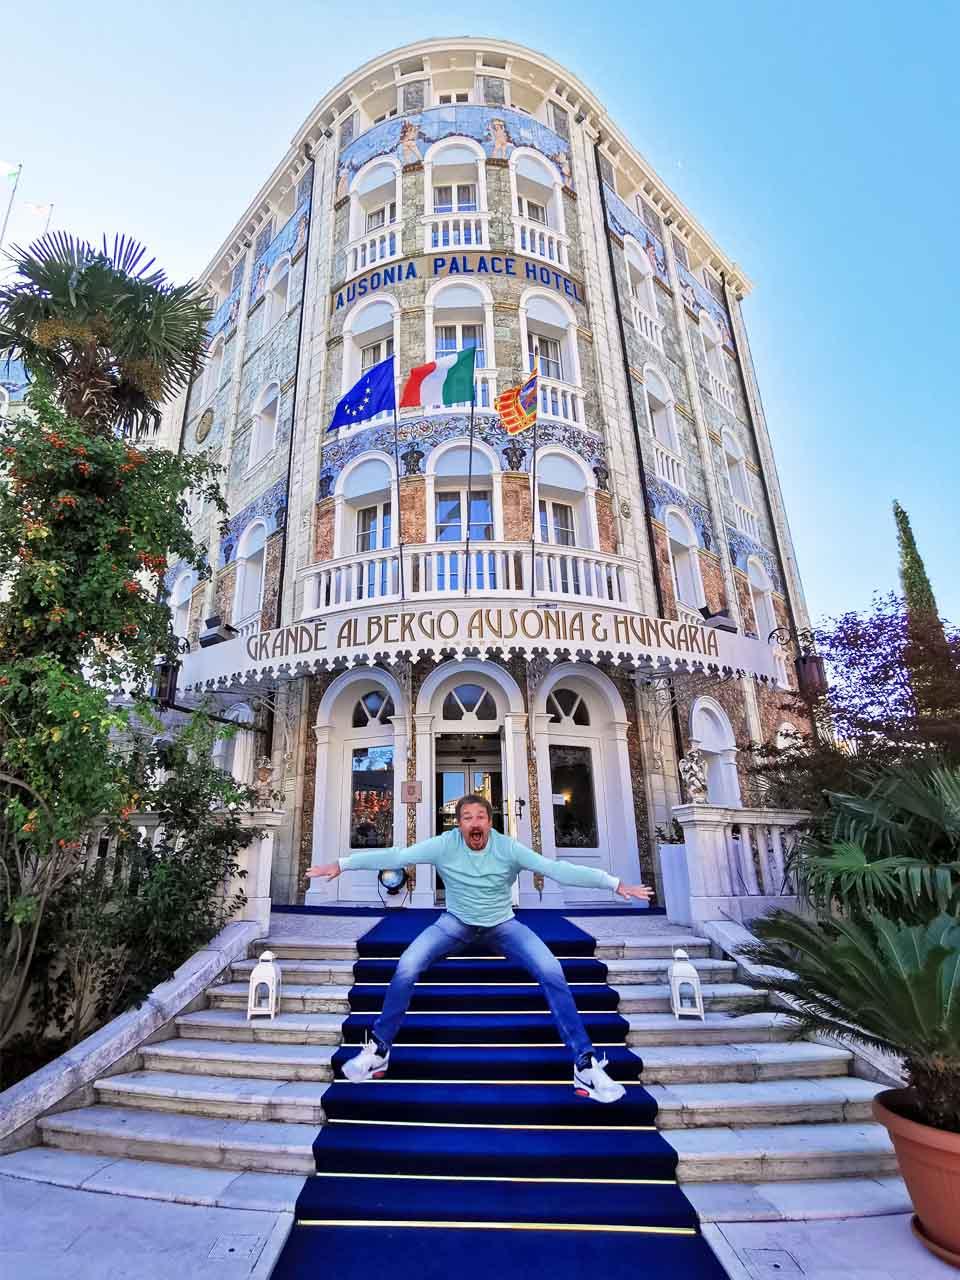 Ausonia Hungaria - Ausonia Palace Hotel